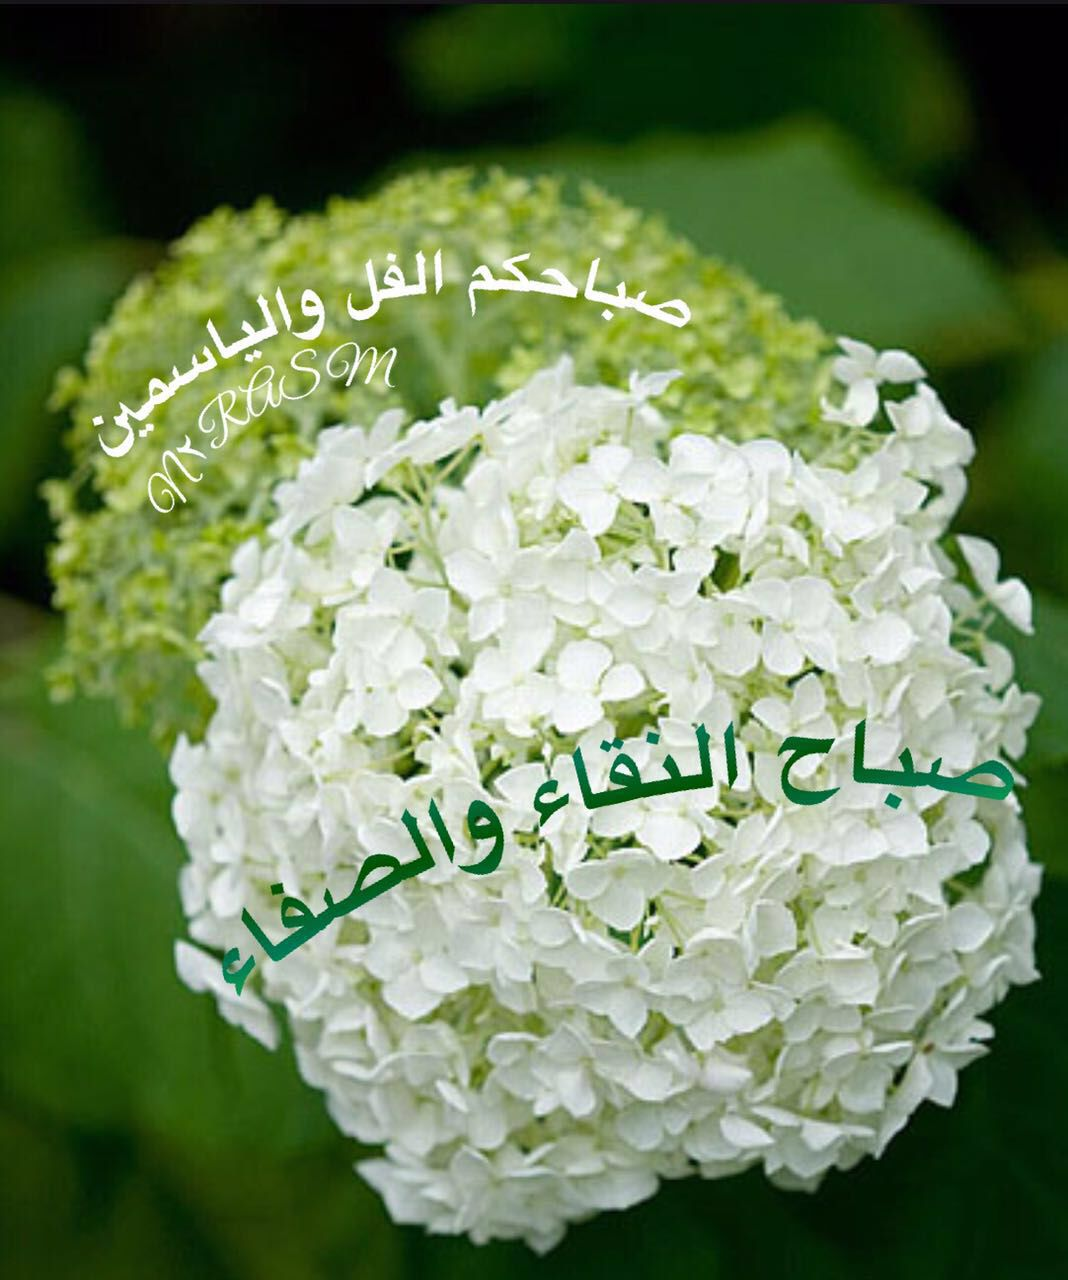 صباح الفل والياسمين Hydrangea Arborescens Annabelle Hydrangea Arborescens Beautiful Flowers Images